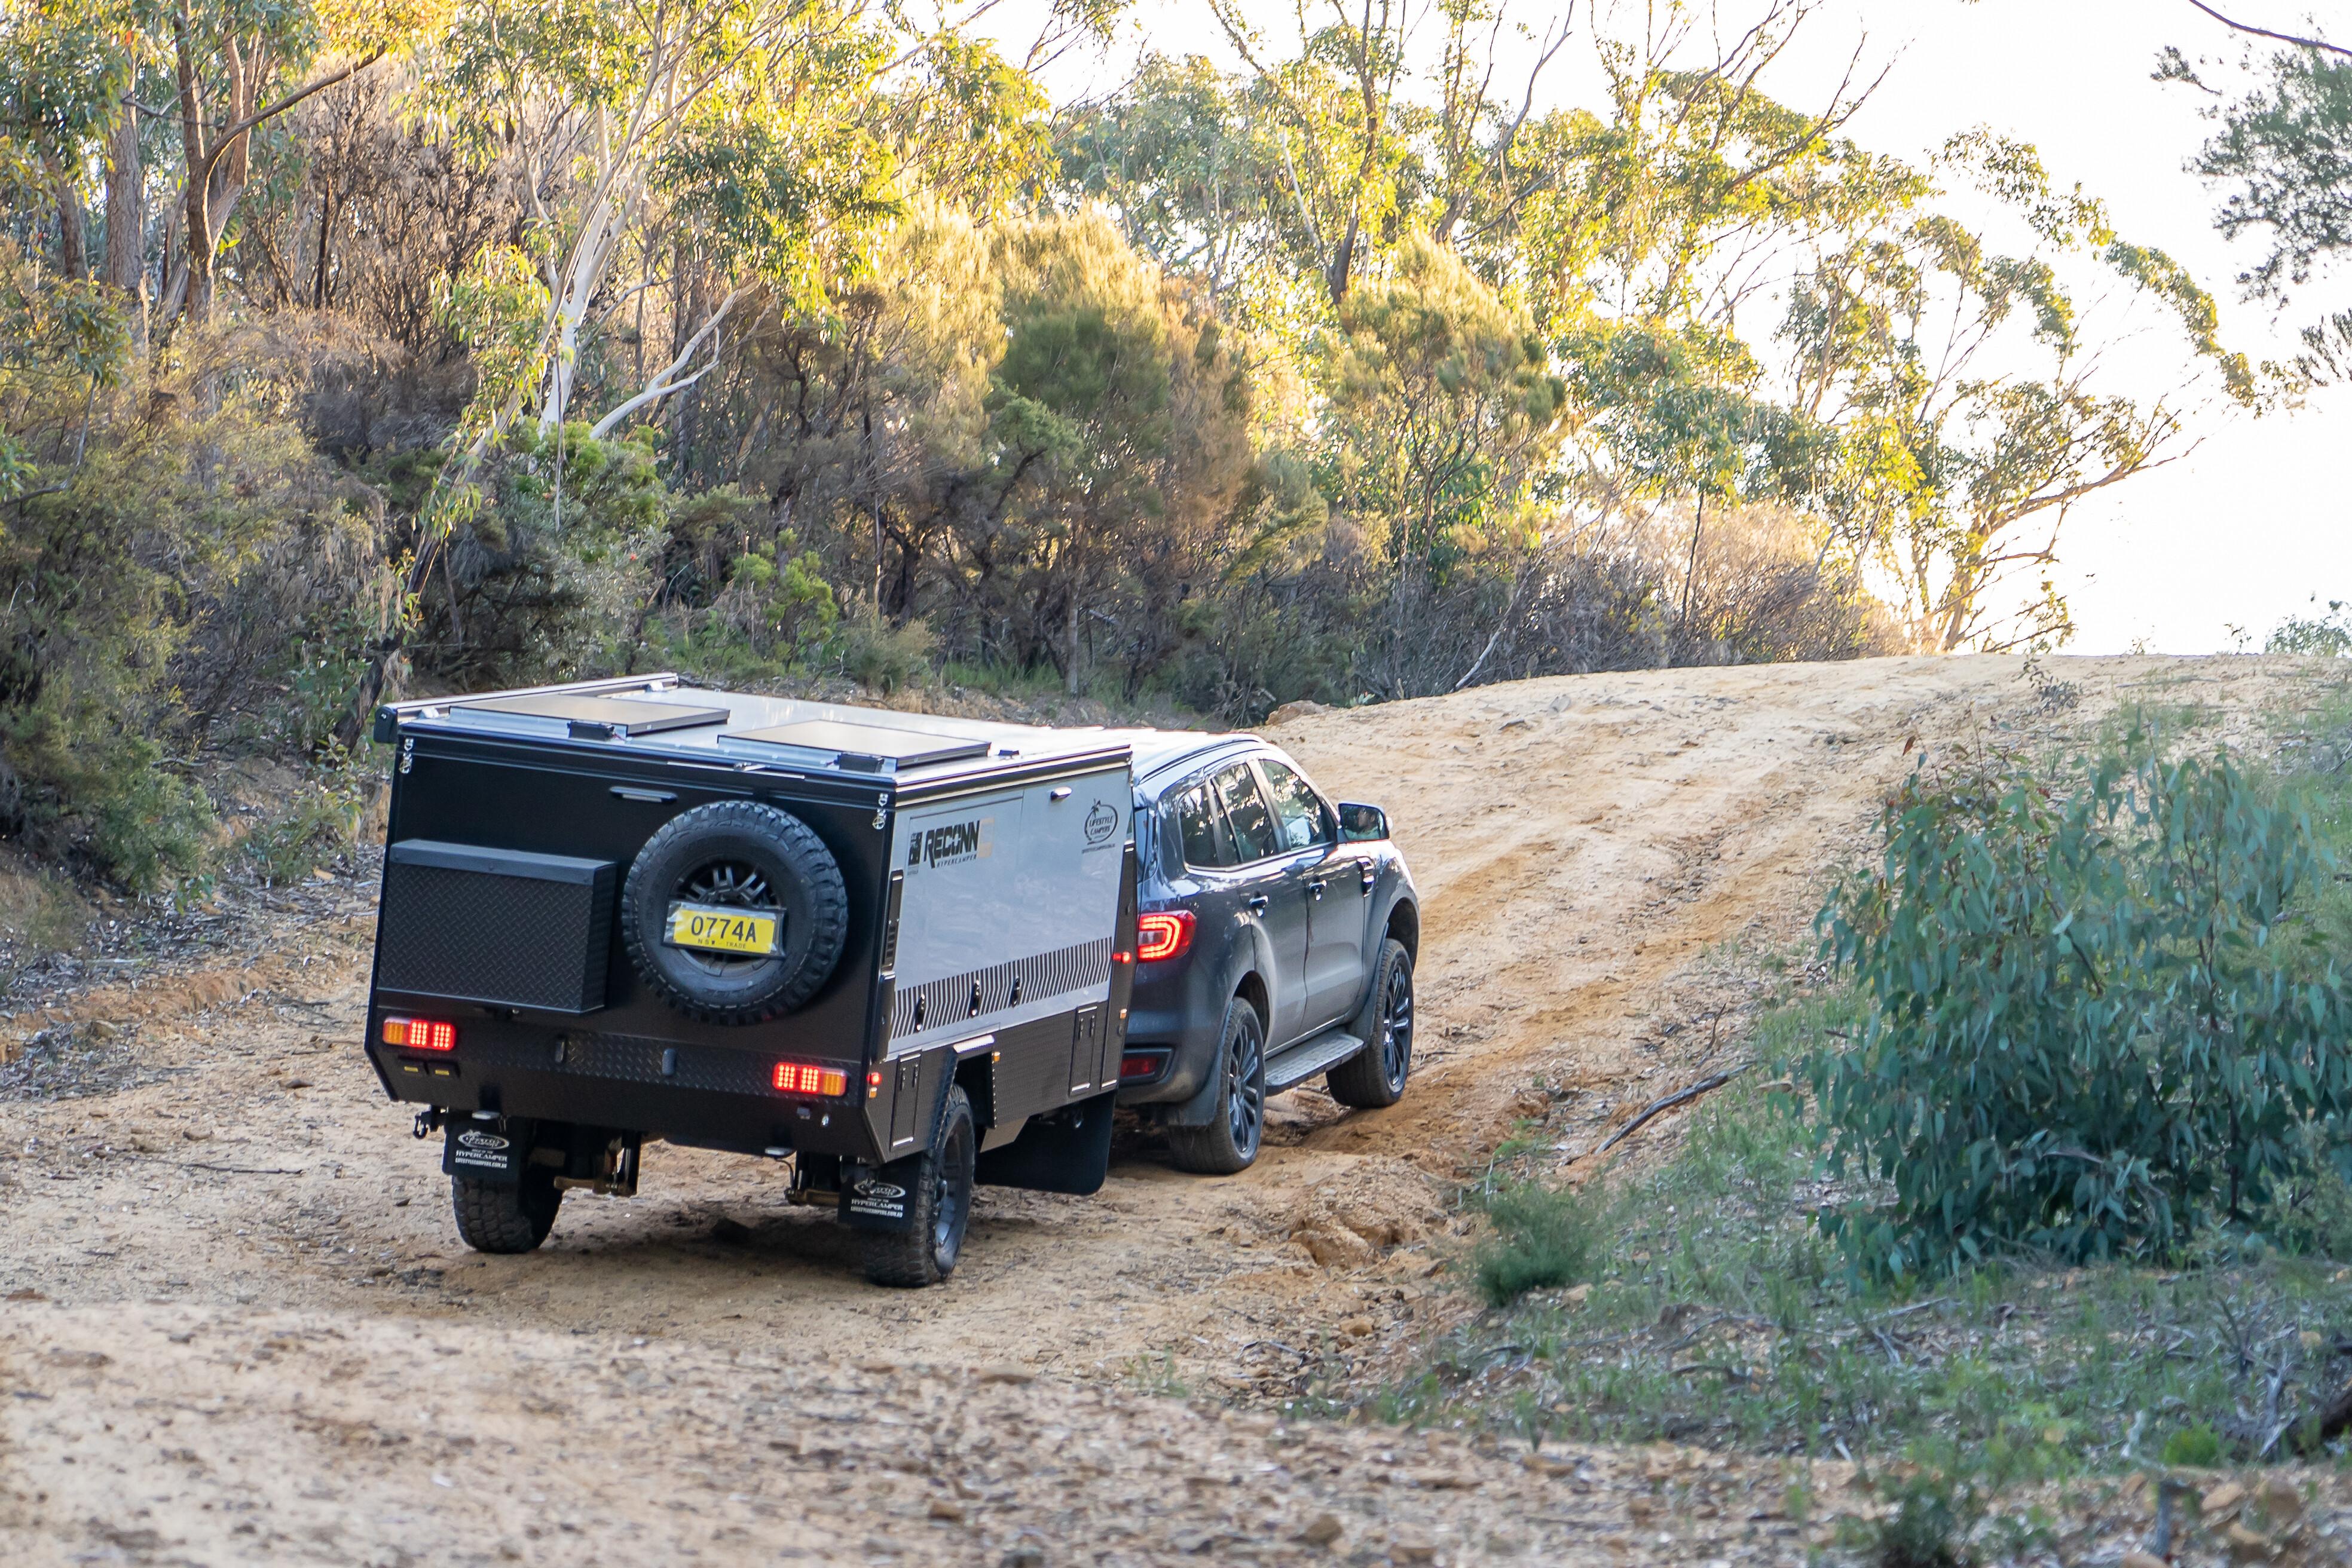 4 X 4 Australia Gear Lifestyle Reconn 2 Camper 8